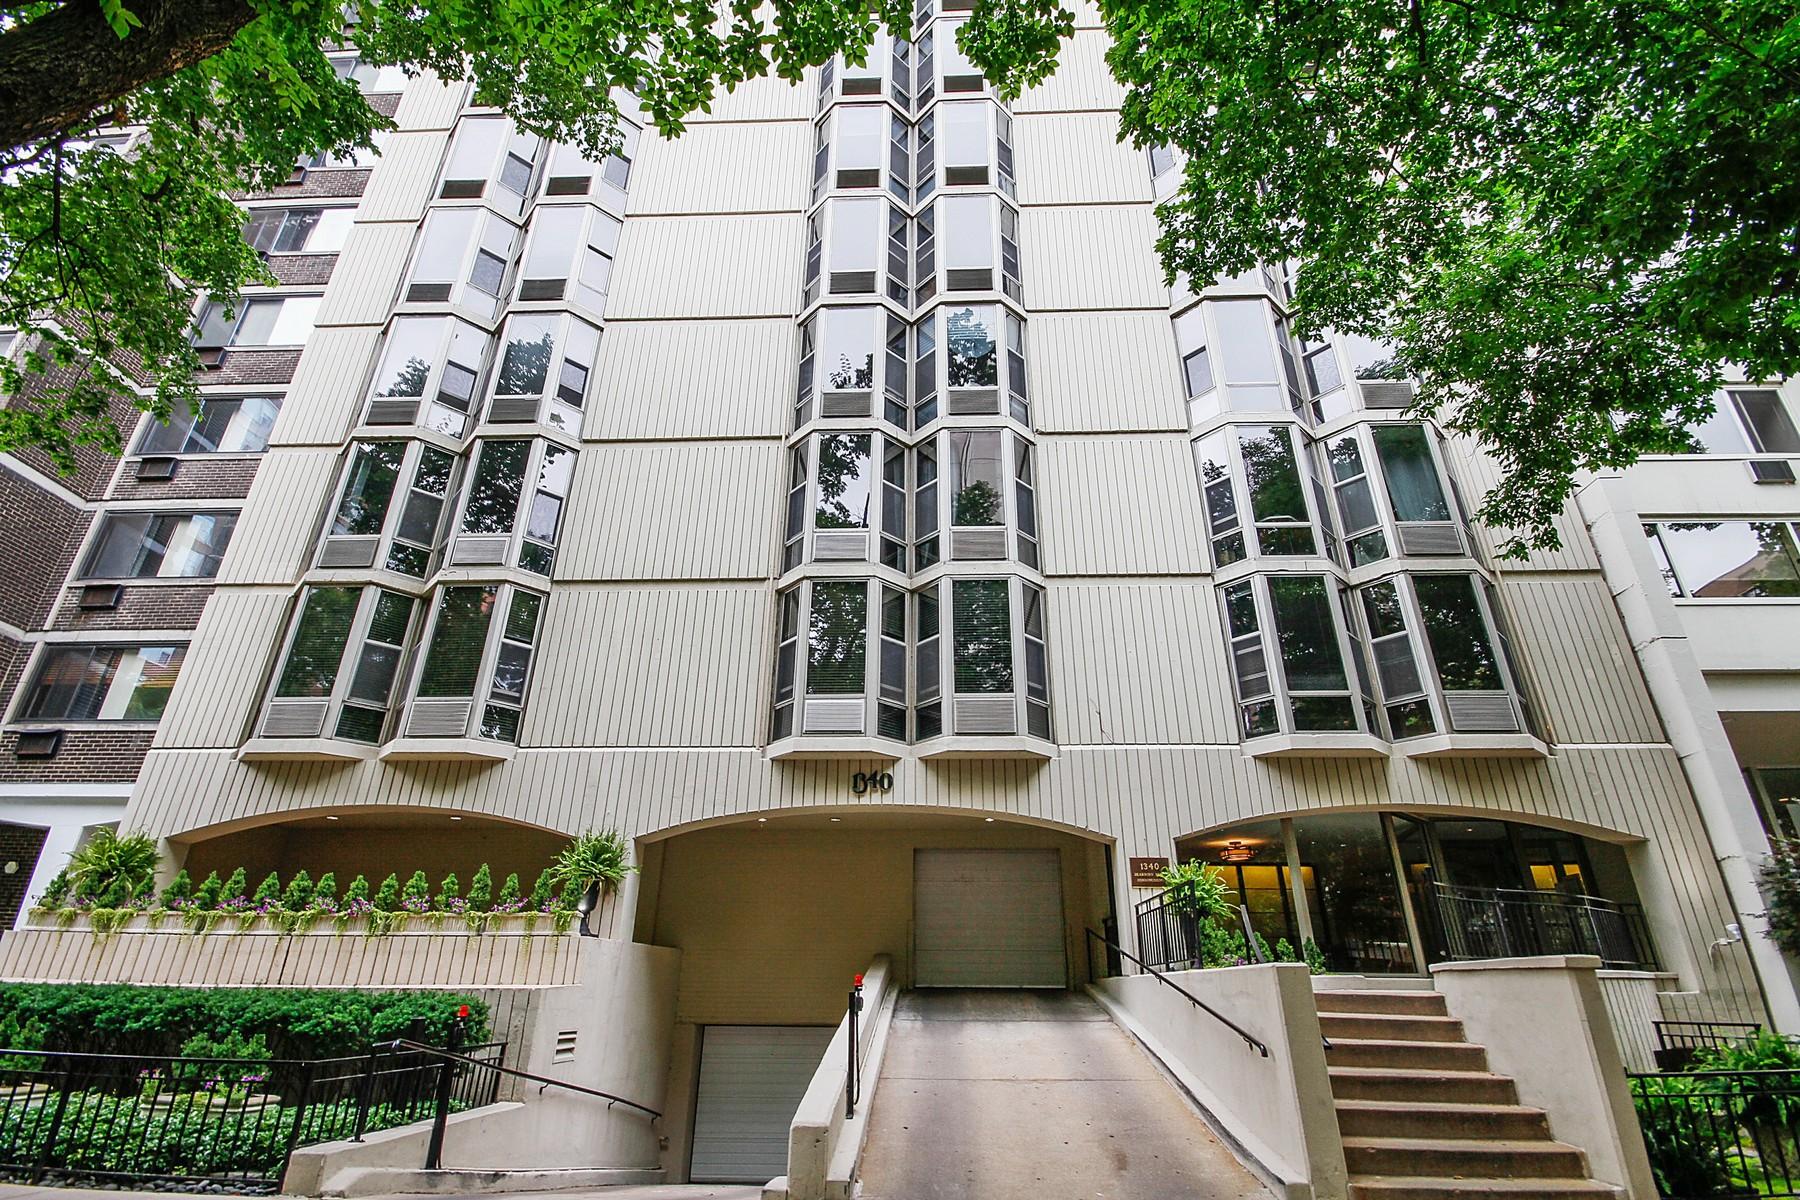 Condominium for Sale at Beautiful Gold Coast Condo 1340 N Dearborn Street Unit 14DE Chicago, Illinois, 60610 United States